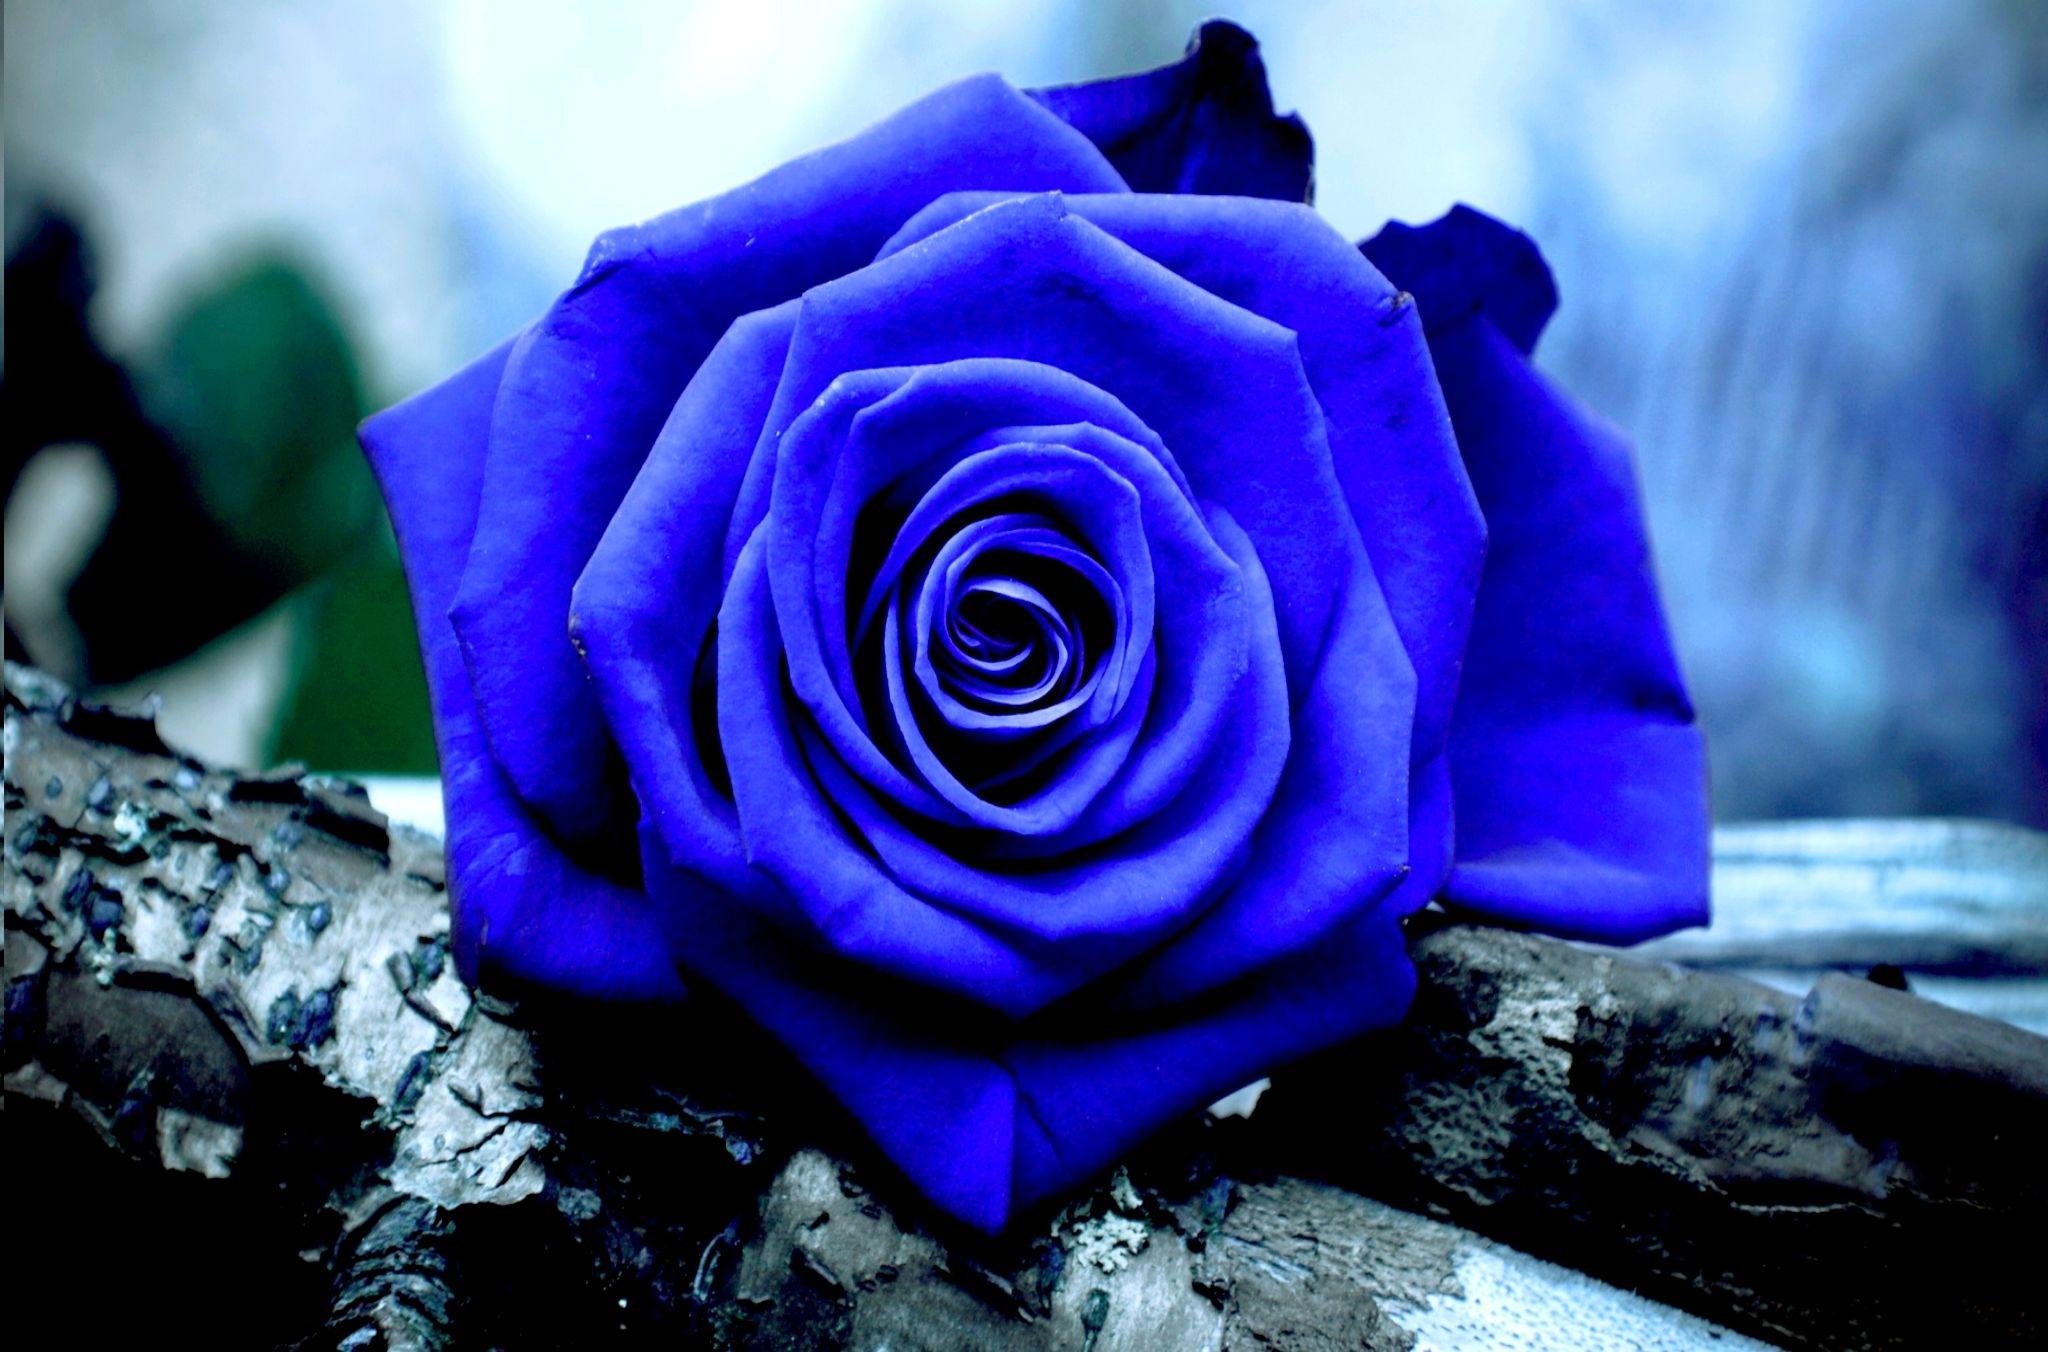 Amazing blue rose wallpaper free download. Blue roses